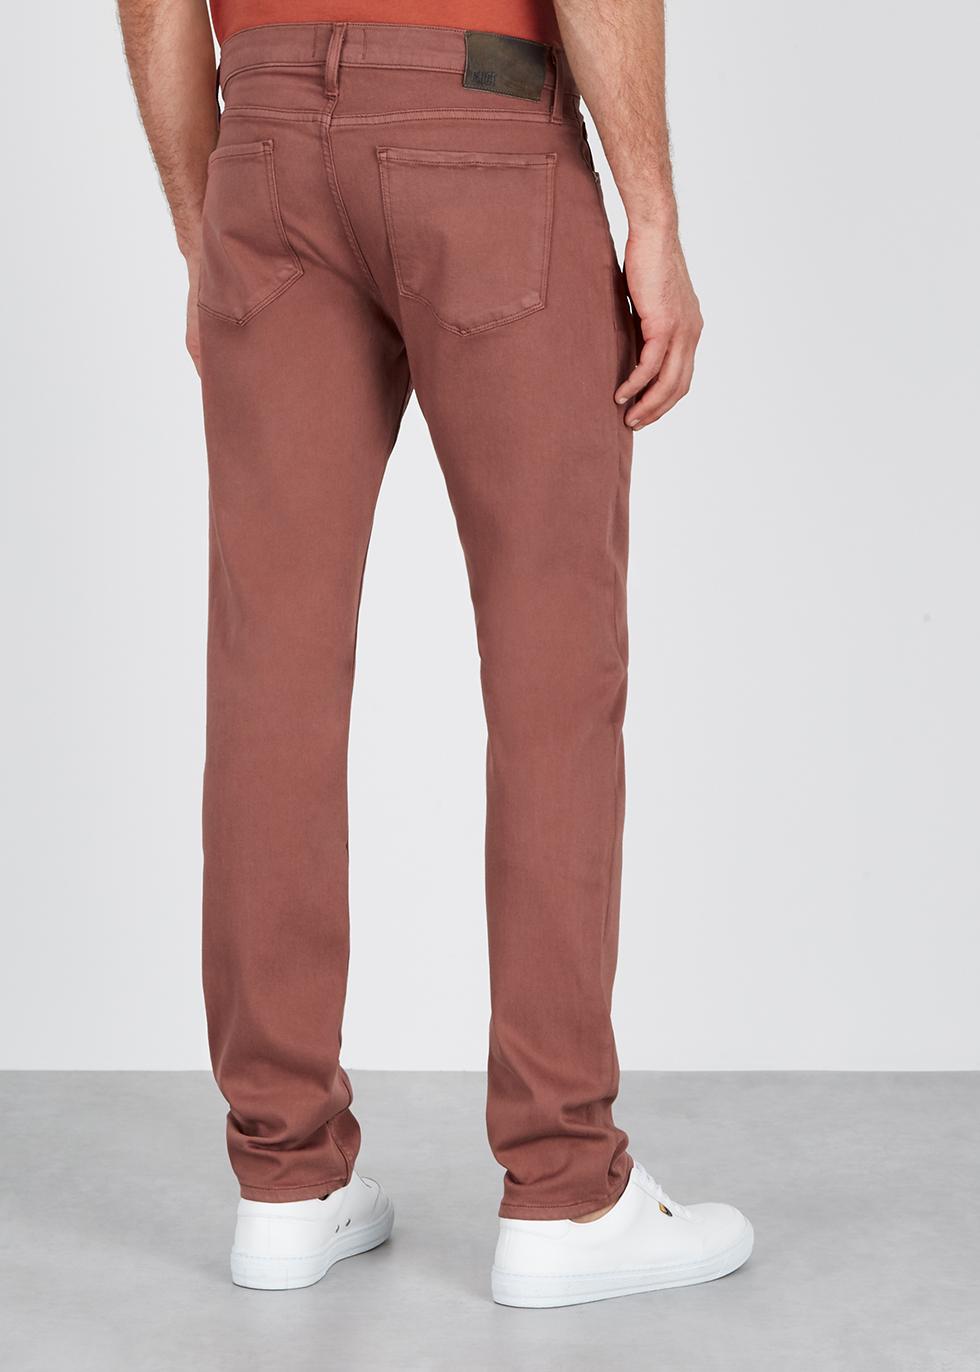 Federal pink slim-leg jeans - Paige